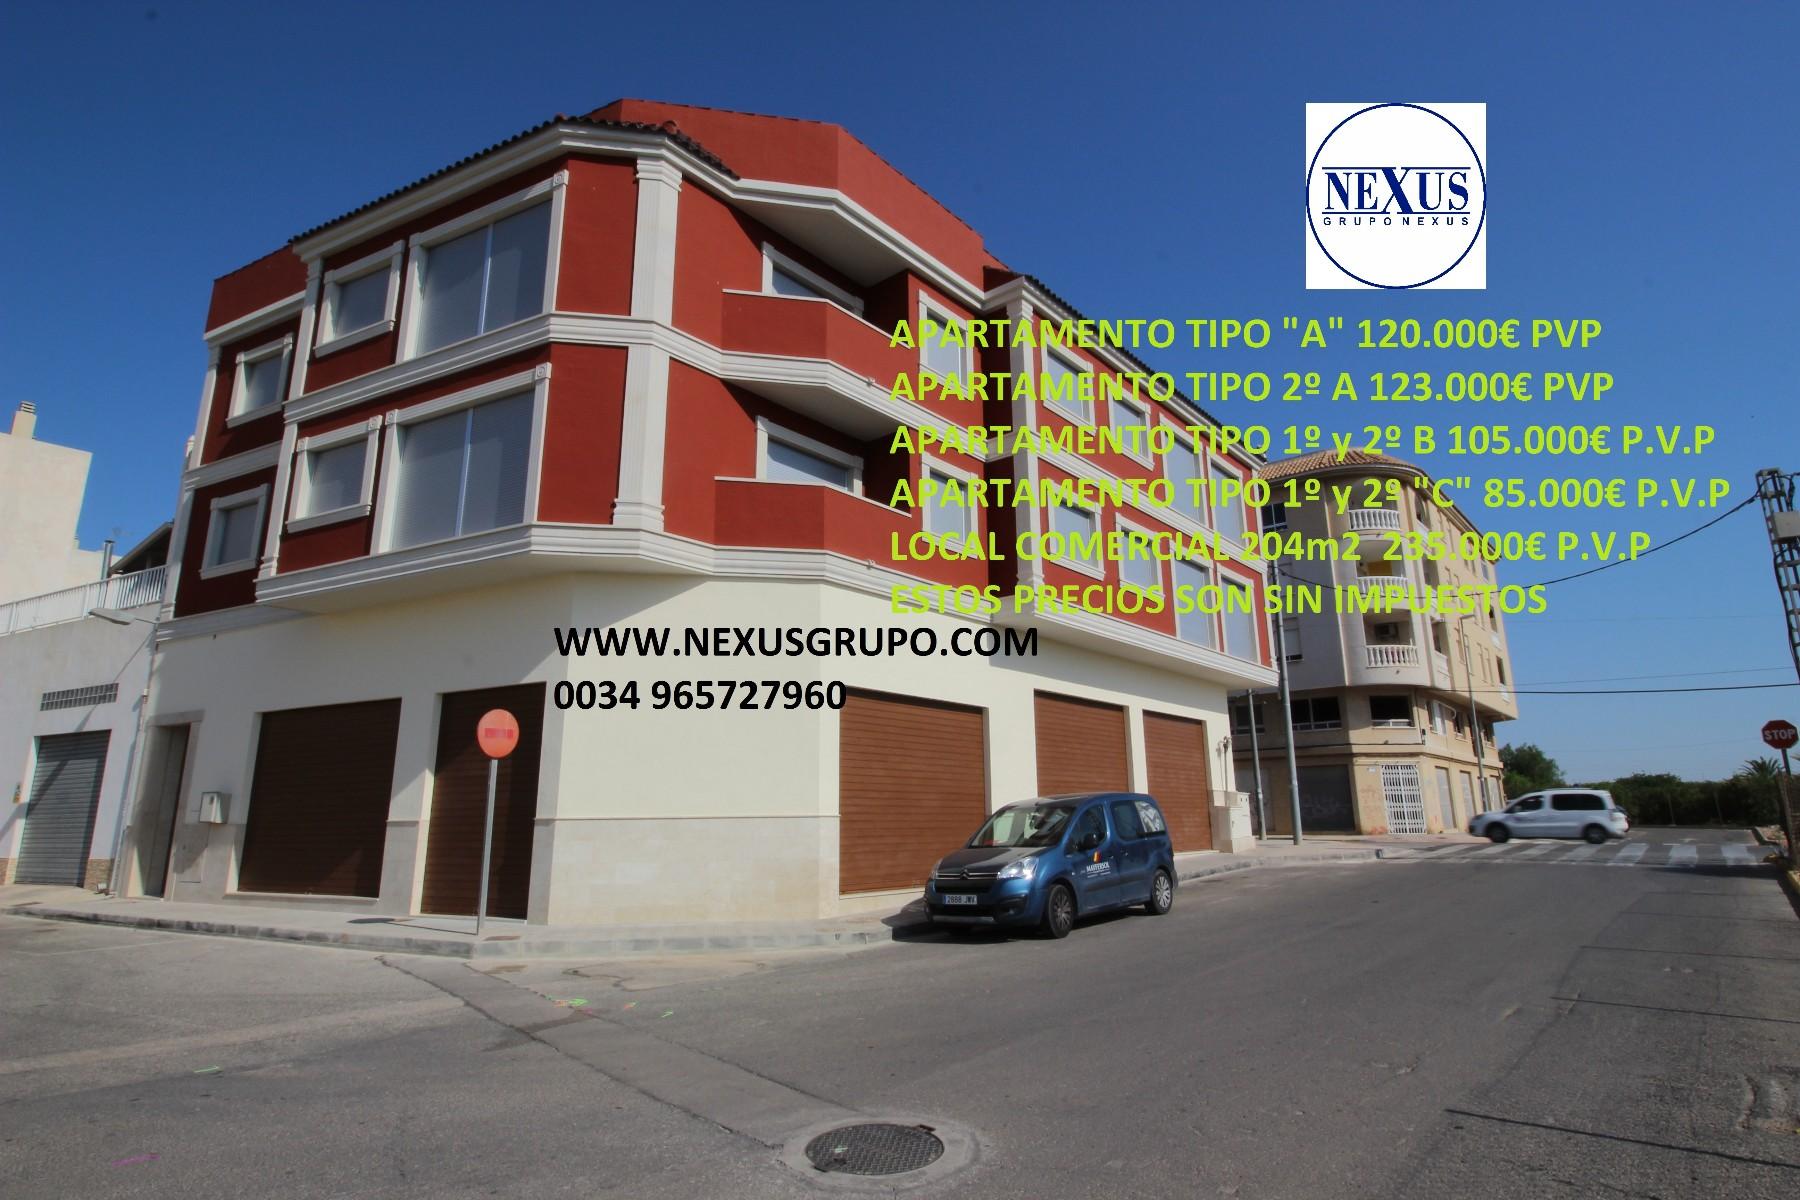 GRUPO NEXUS REAL STATE  sells six new construction apartments in Nexus Grupo